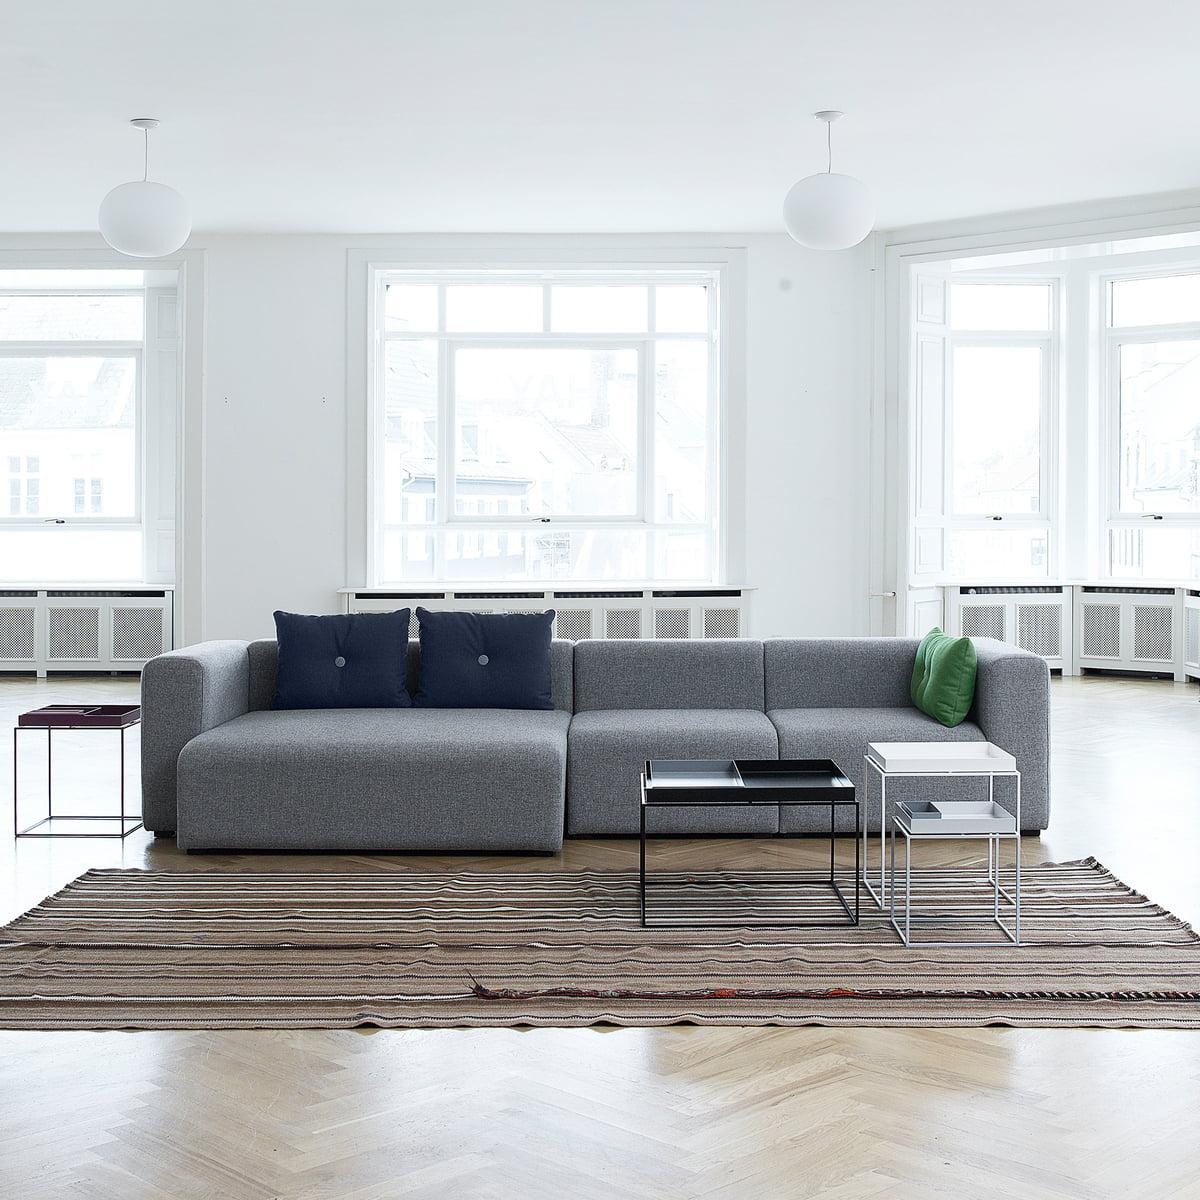 module narrow pour canap mags de hay. Black Bedroom Furniture Sets. Home Design Ideas